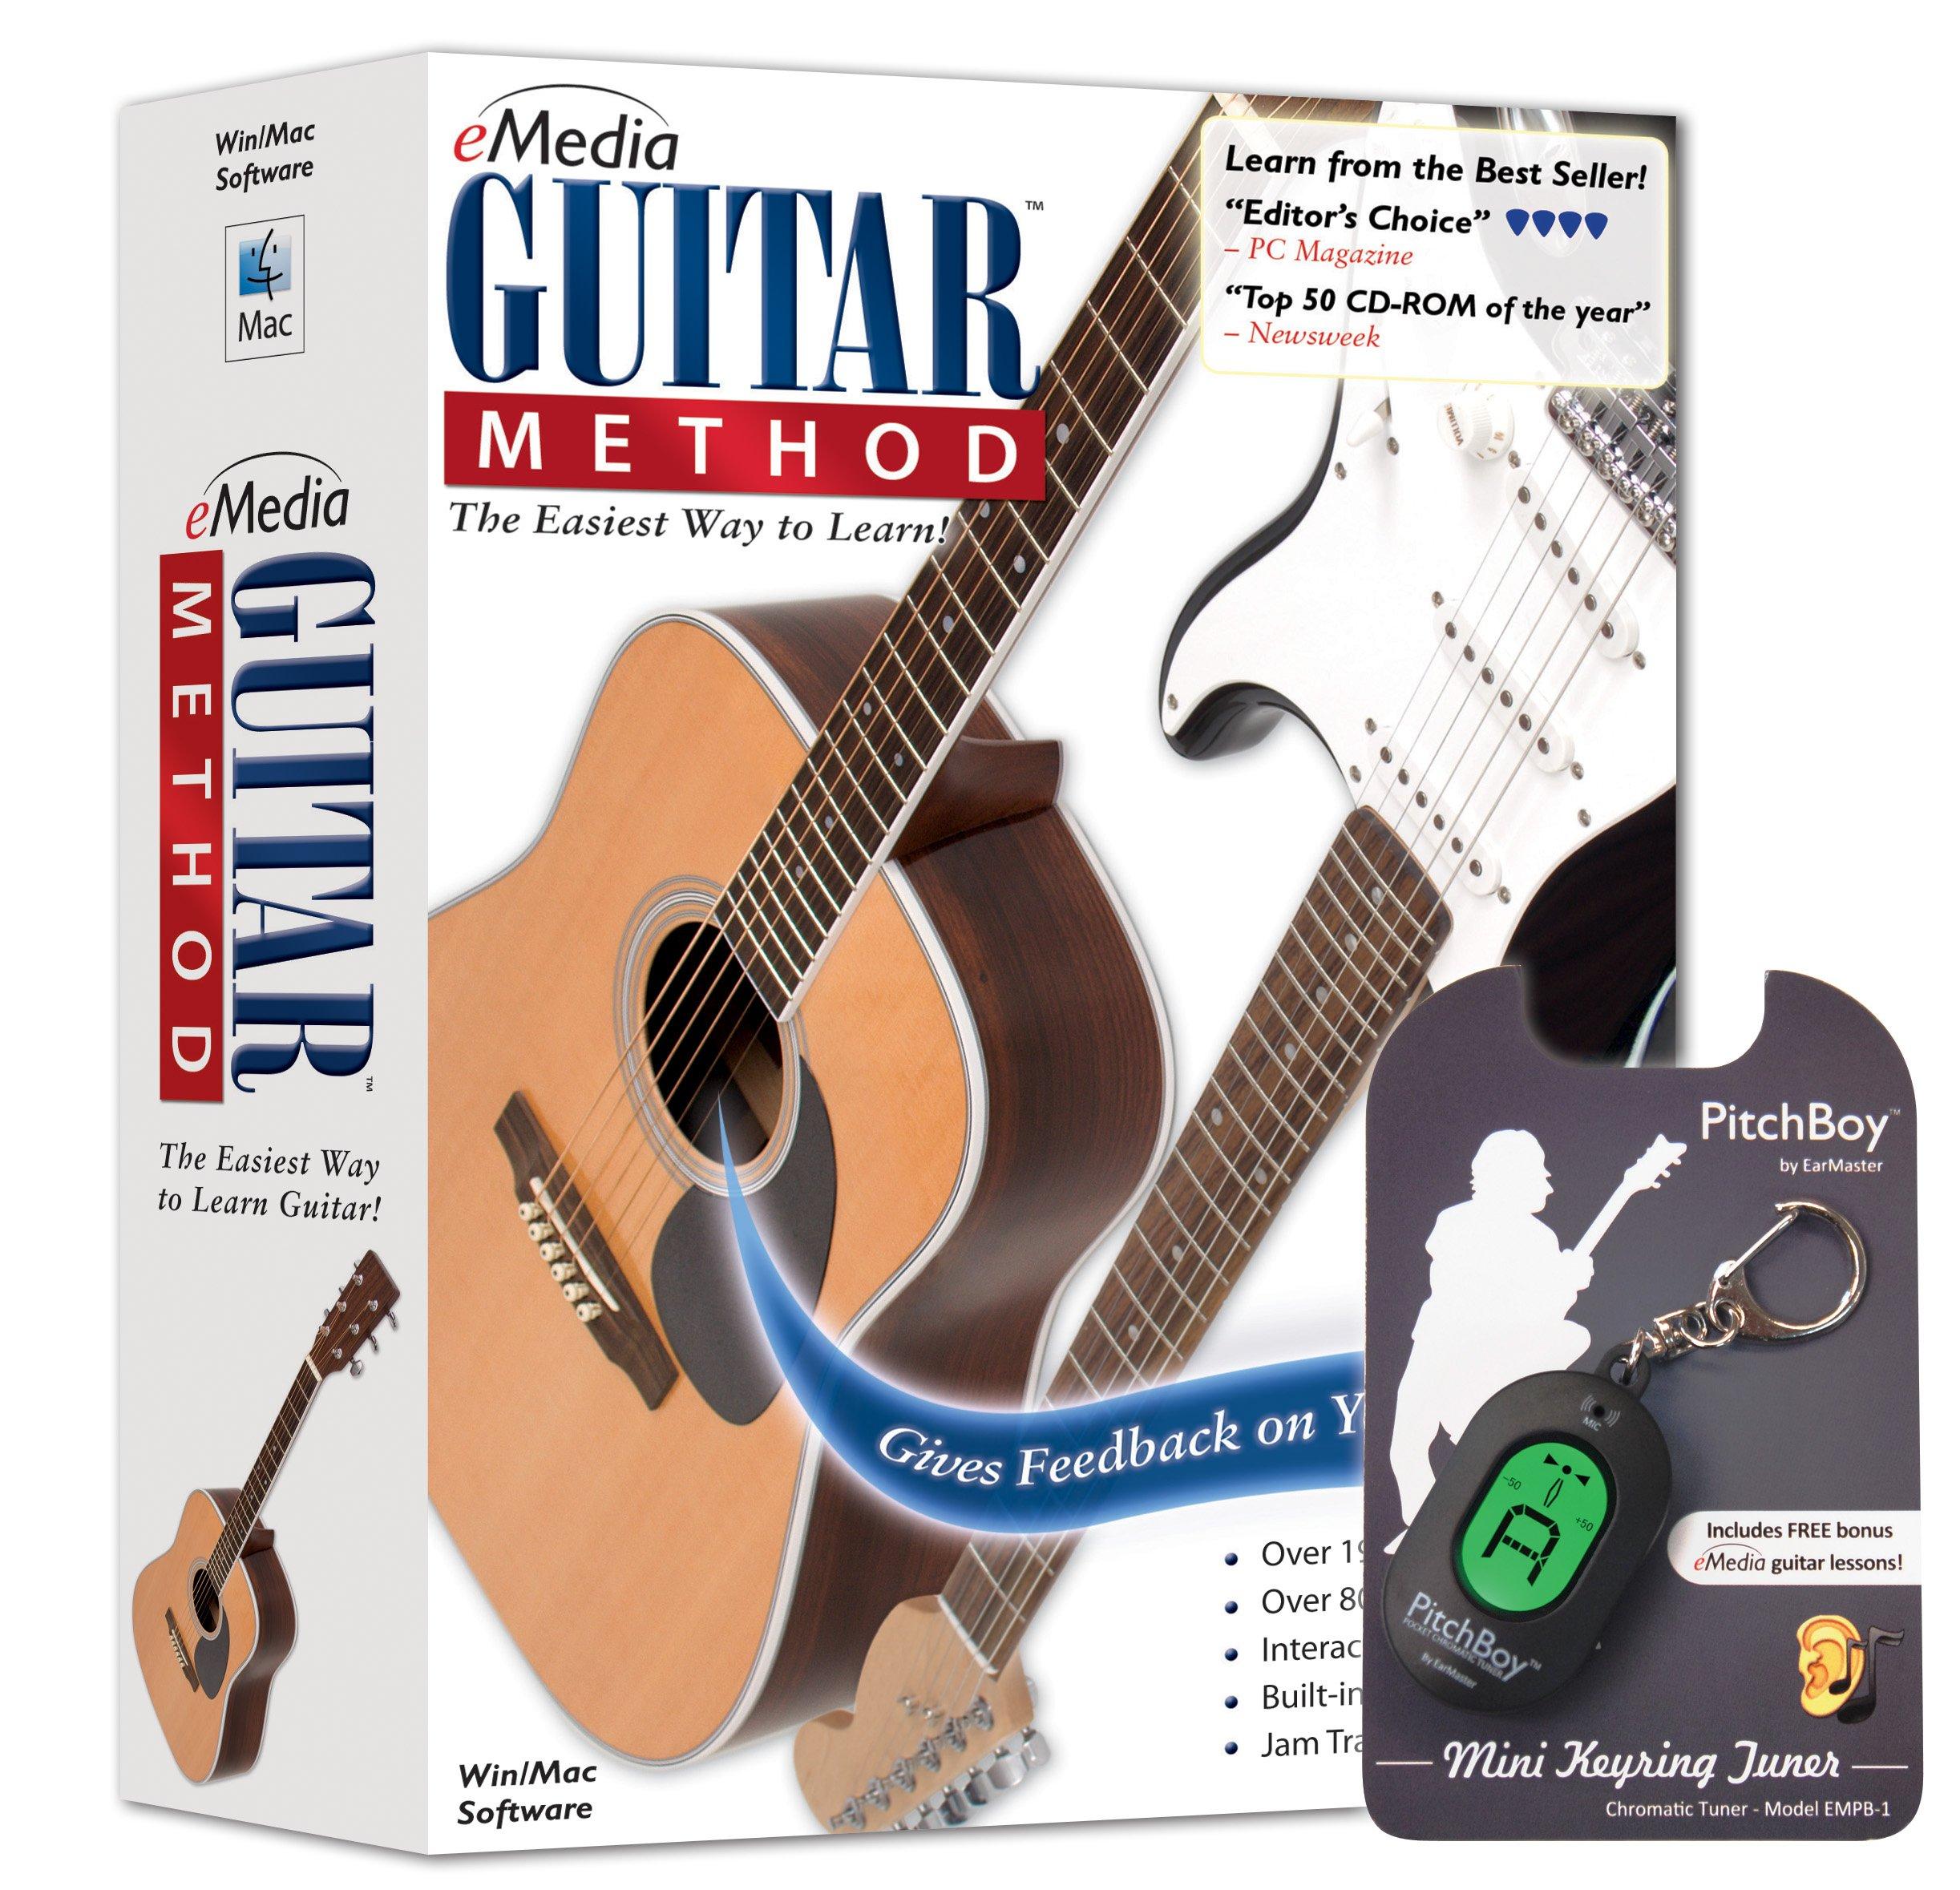 eMedia Guitar Method v6 - with Pitchboy Mini Keyring Tuner (Amazon-Exclusive) by eMedia